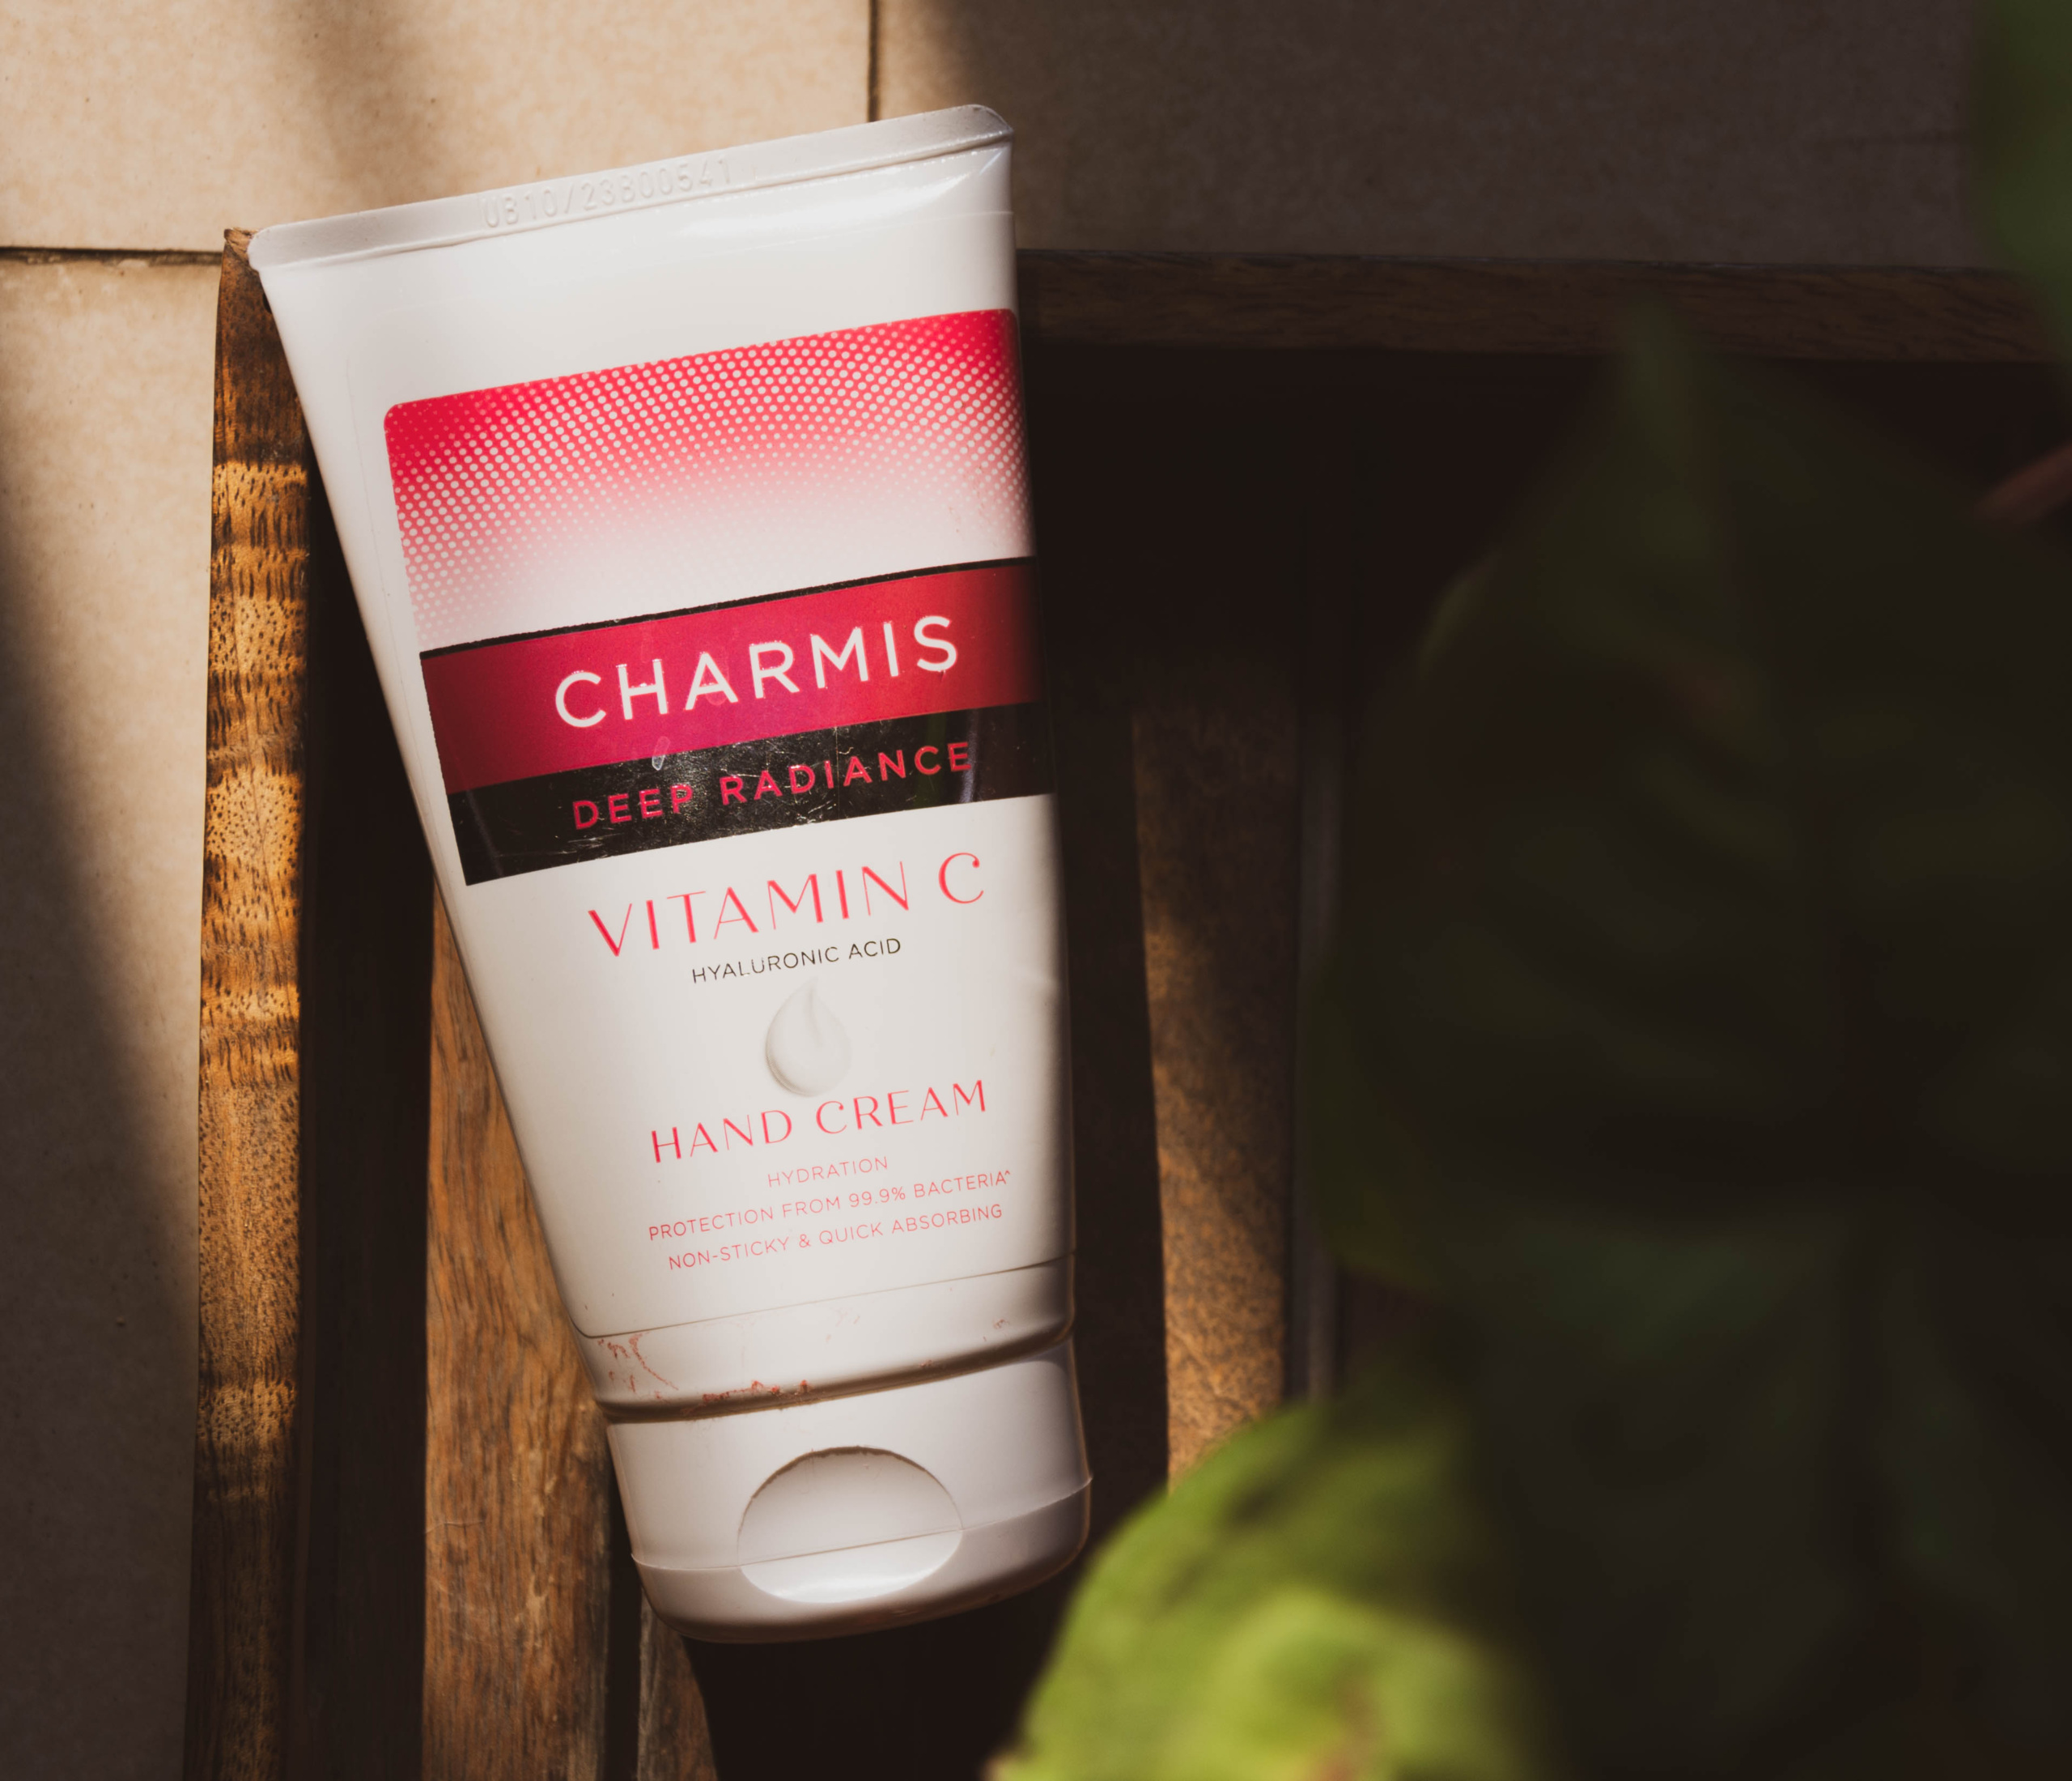 Charmis Deep Radiance Vitamin C Hand Cream Review